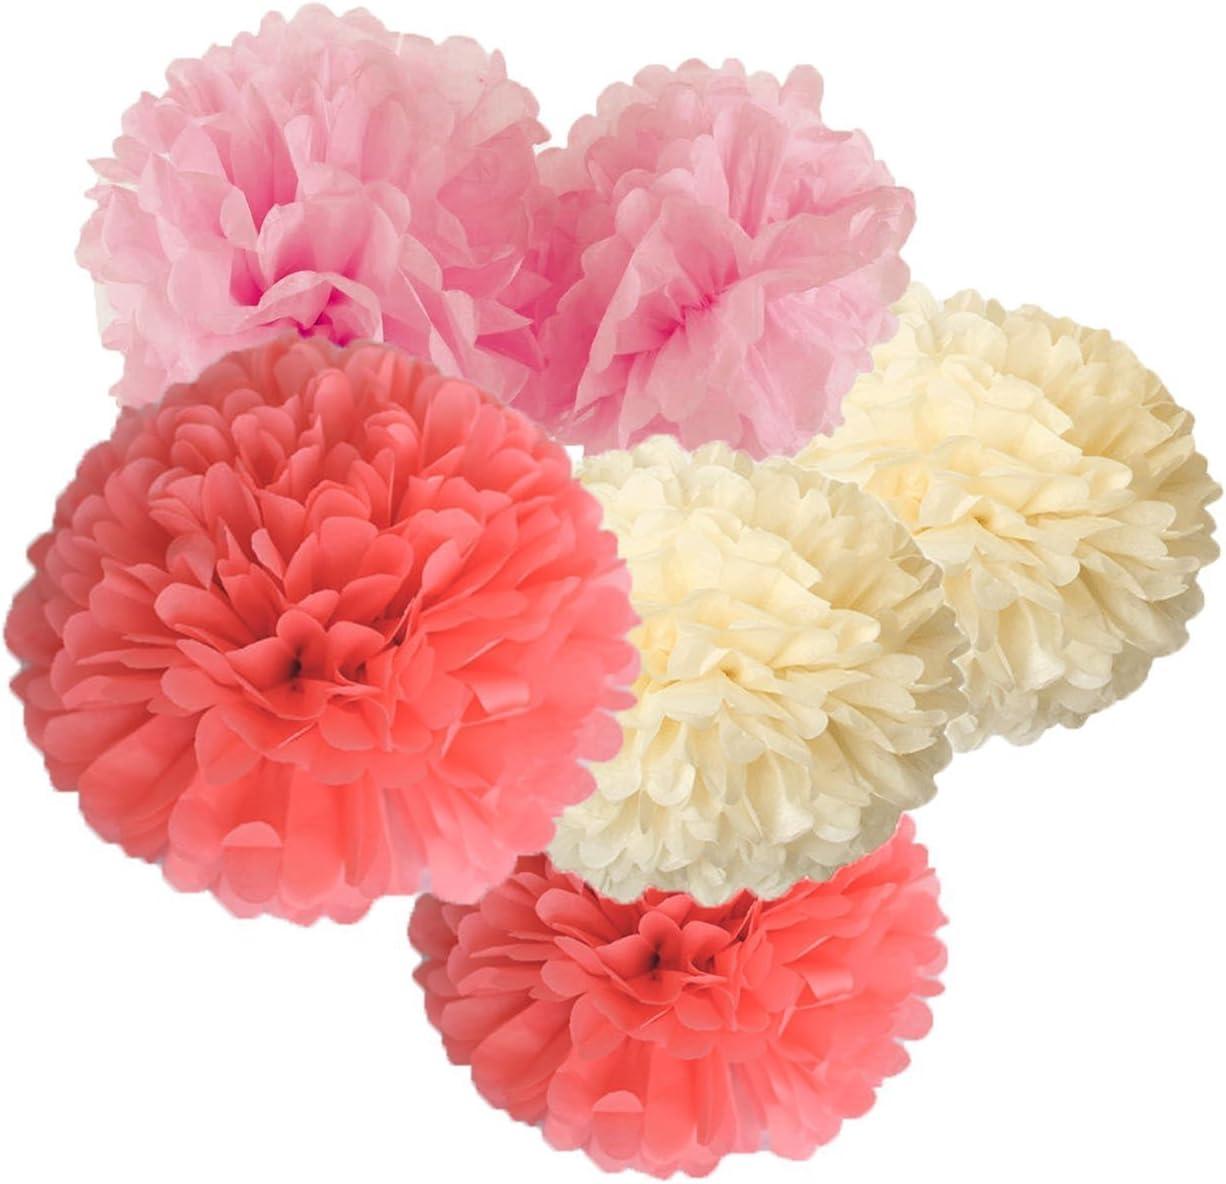 "HappyField 12PCS 10/"" 12/"" Baby Pink Blue White Tissue Paper Pom Poms Flower Gender Reveal Party Supplies Gender Reveal Party Decorations Boy or Girl Baby Shower Decorations Pink and Blue Decorations"